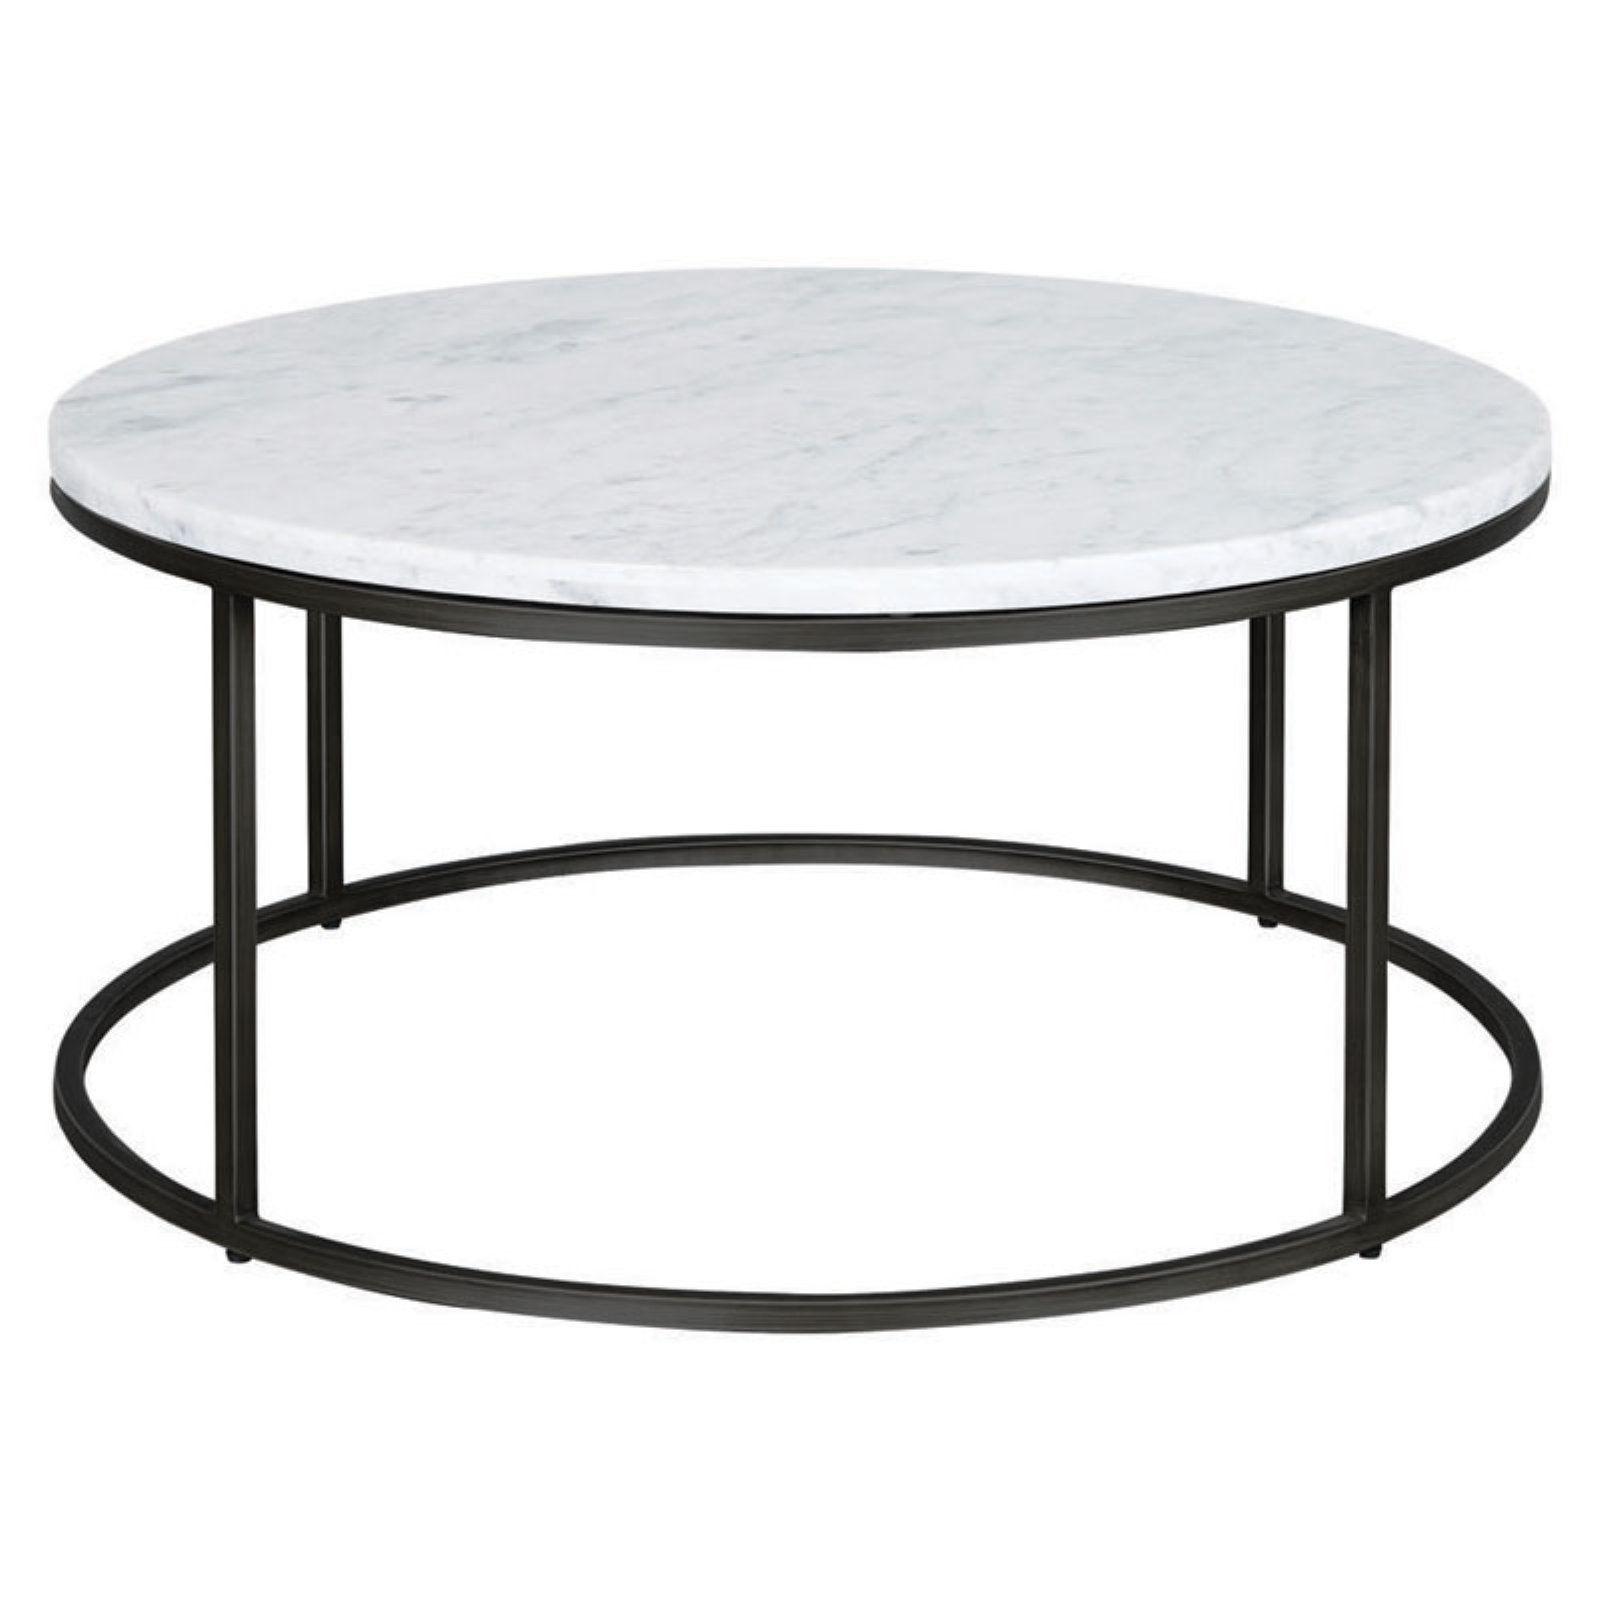 Palliser Furniture Julien Round Cocktail Table Coffee Table Furniture Palliser Furniture [ 1600 x 1600 Pixel ]